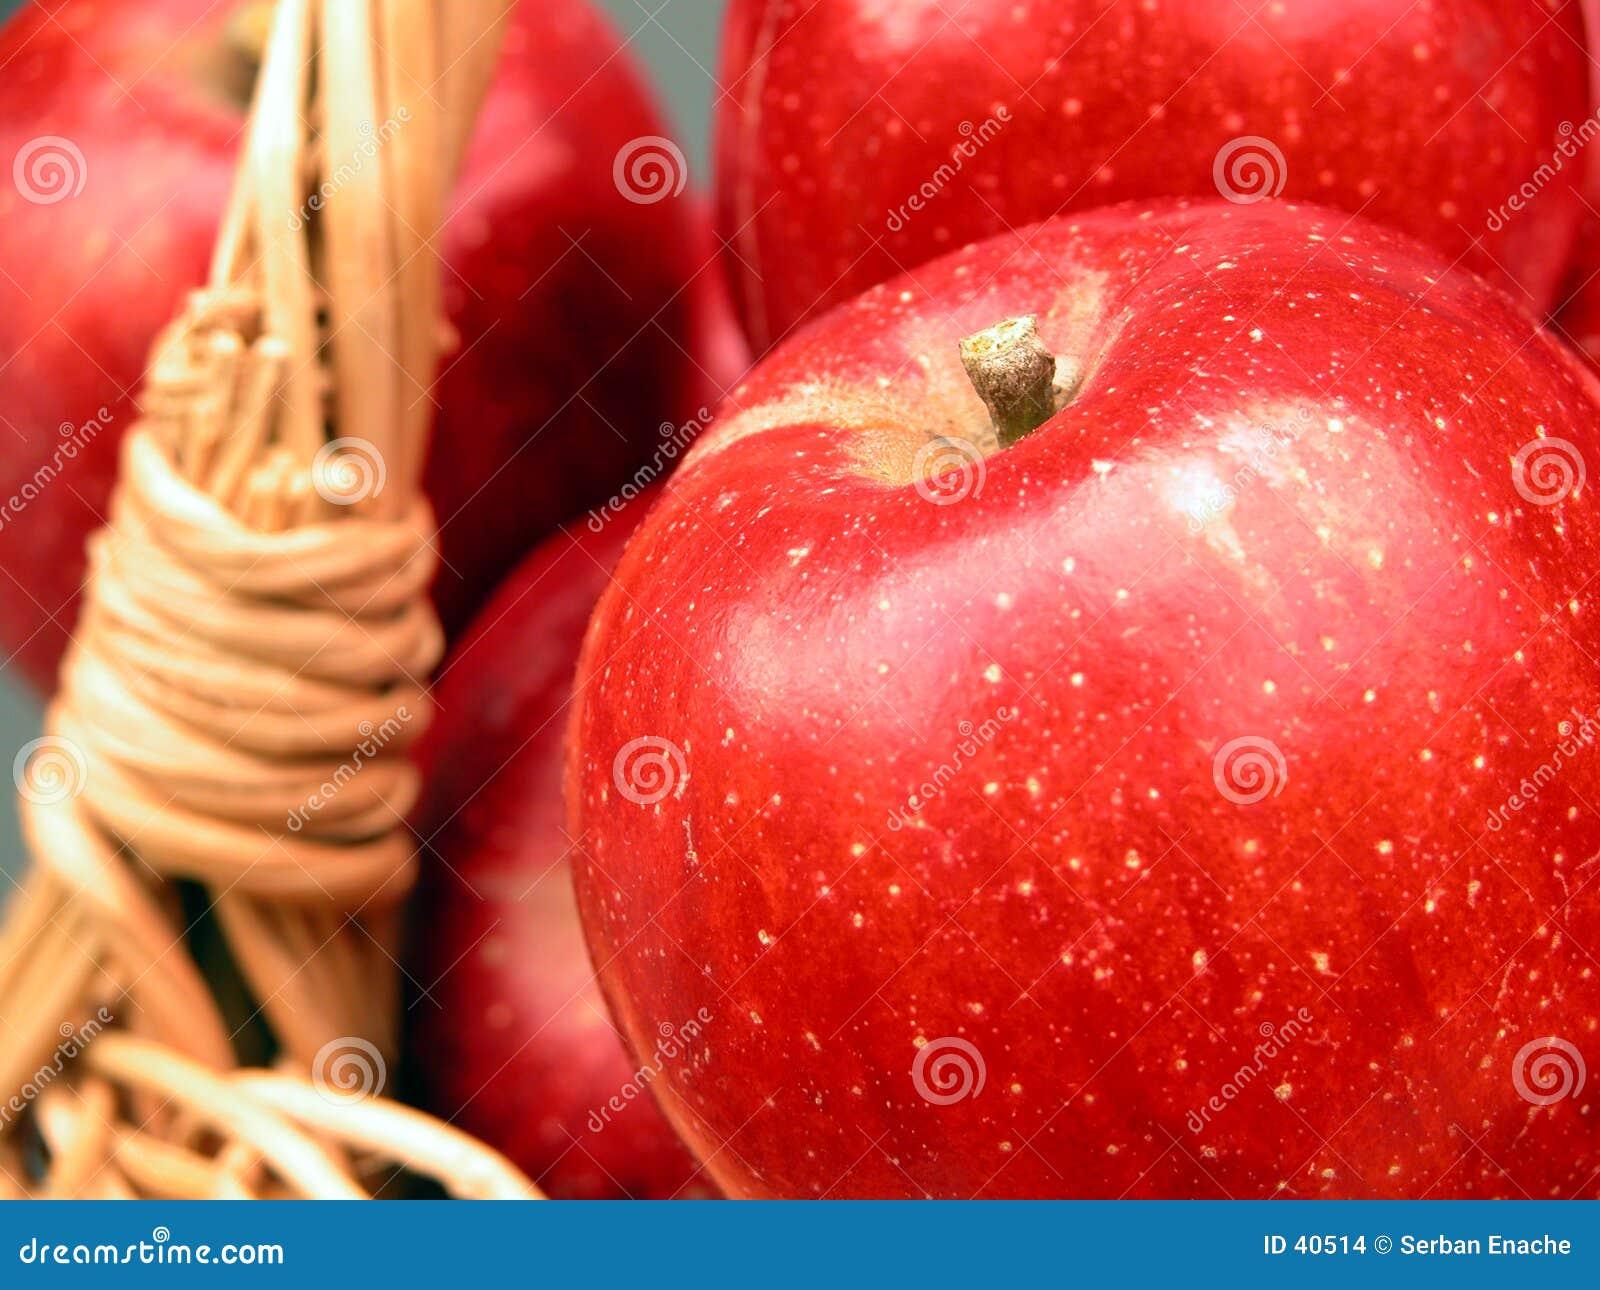 Vitamins basket - apples 2